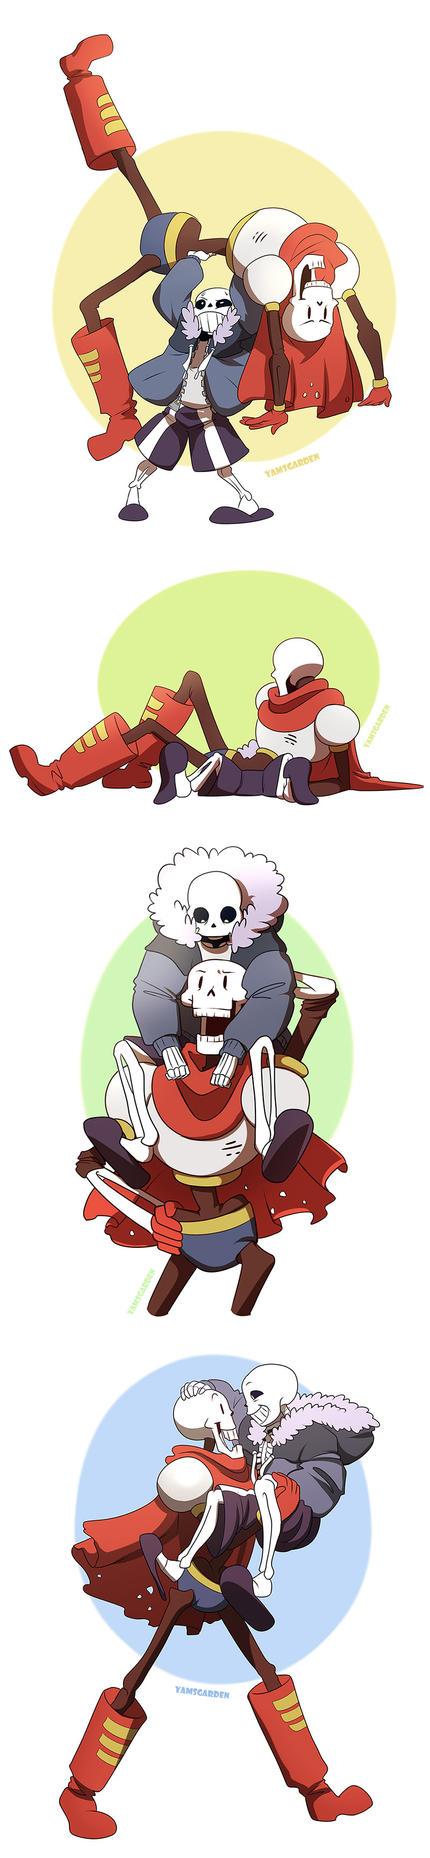 Goofy Skeletons Bros 2 by YAMsgarden